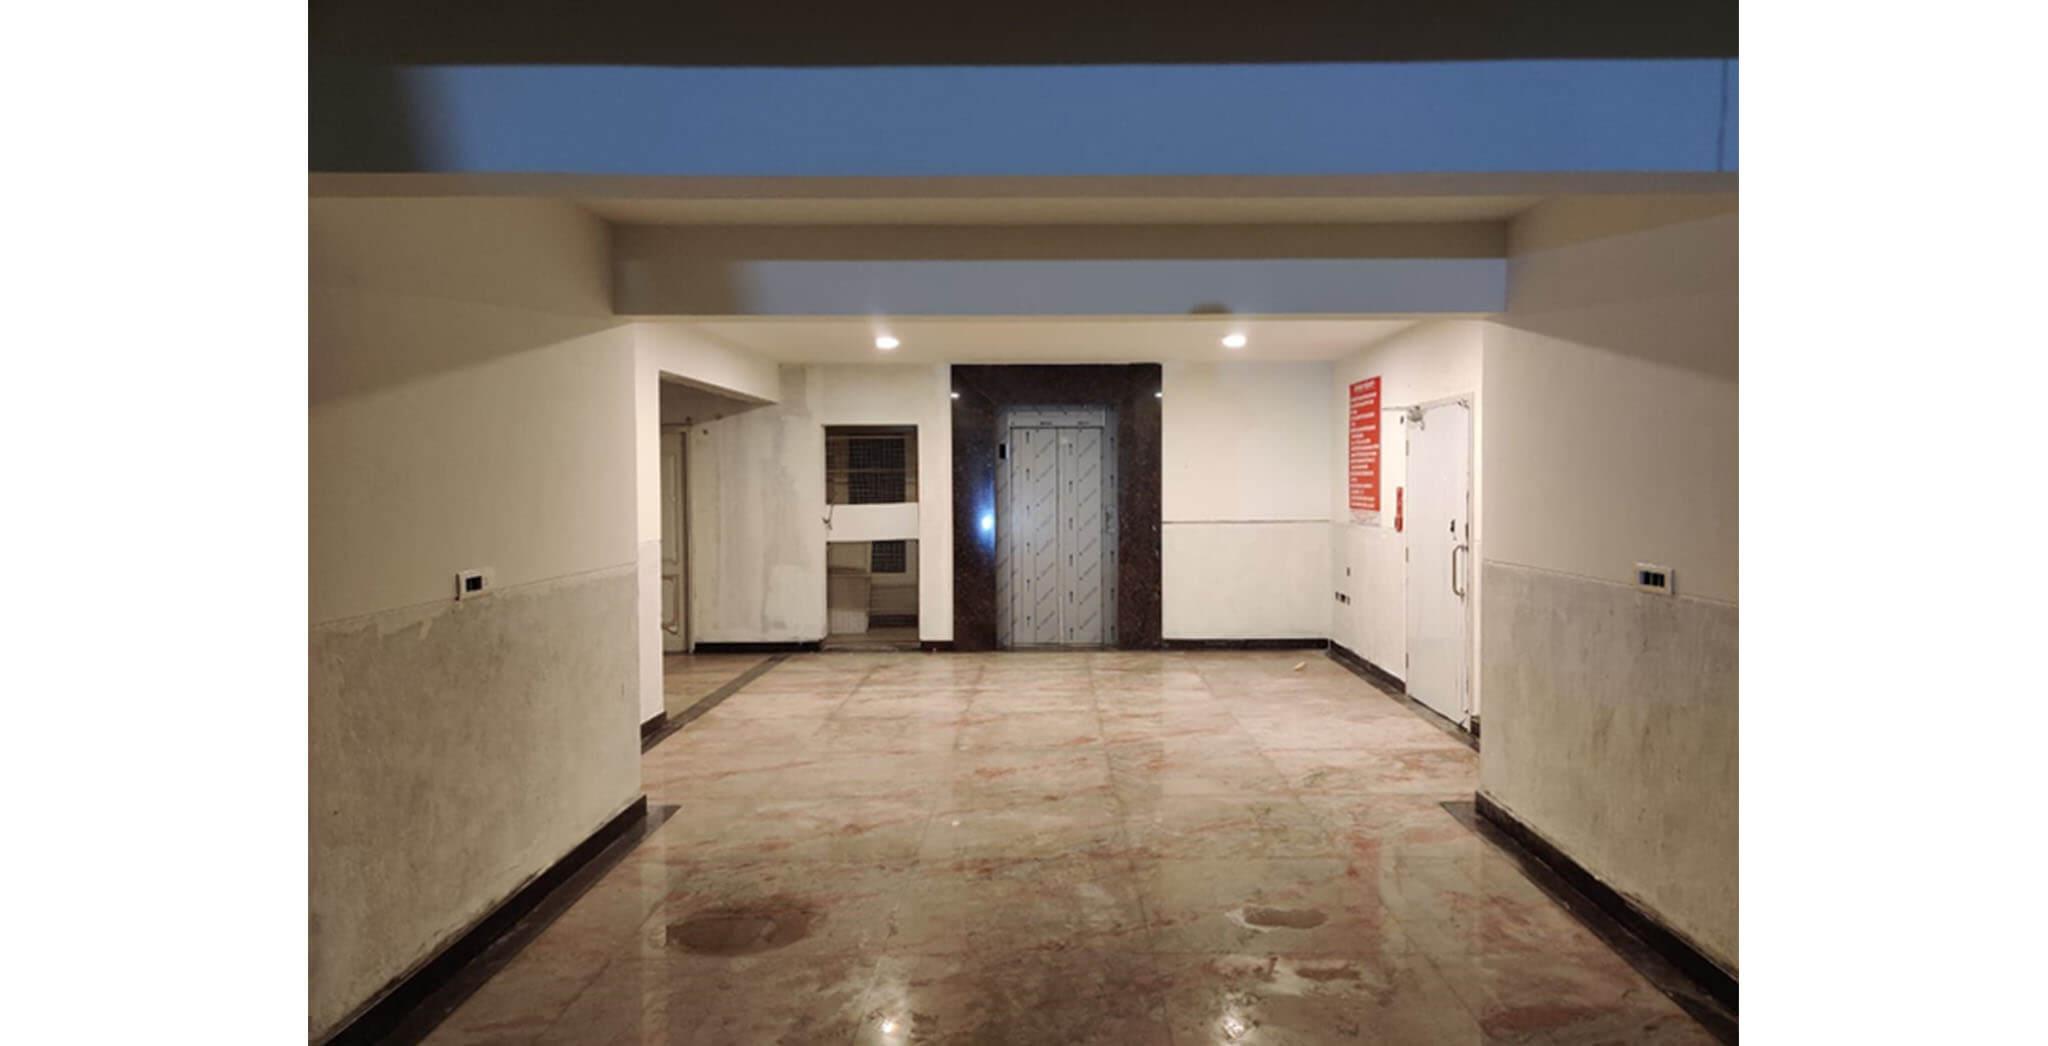 Feb 2021 - GF lobby area flooring work is completed